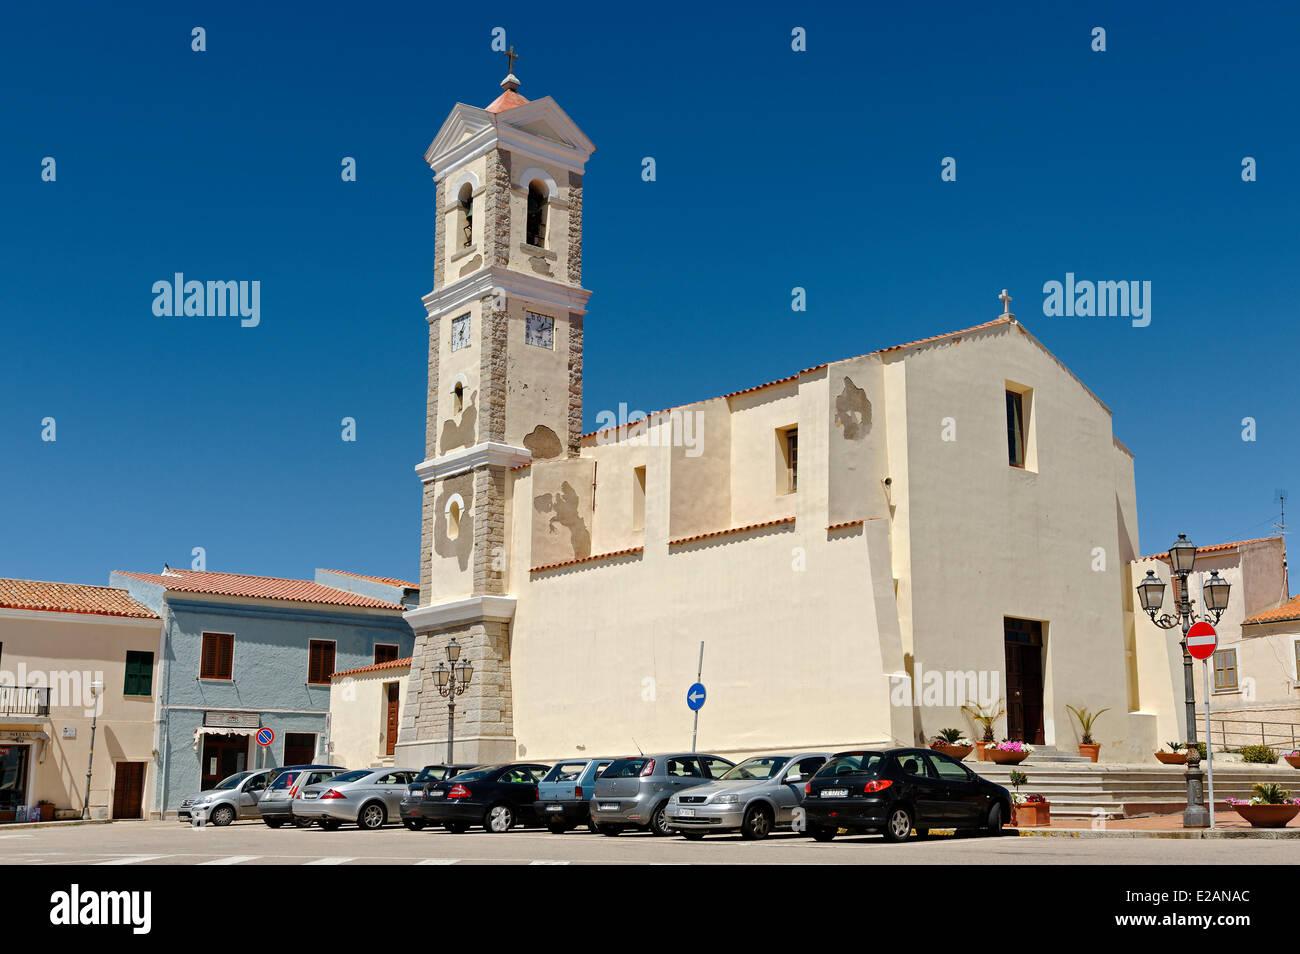 Italy, Sardinia, Olbia Tempio Province, Santa Teresa Gallura, Piazza San Vittorio, Santa Teresa Parish - Stock Image